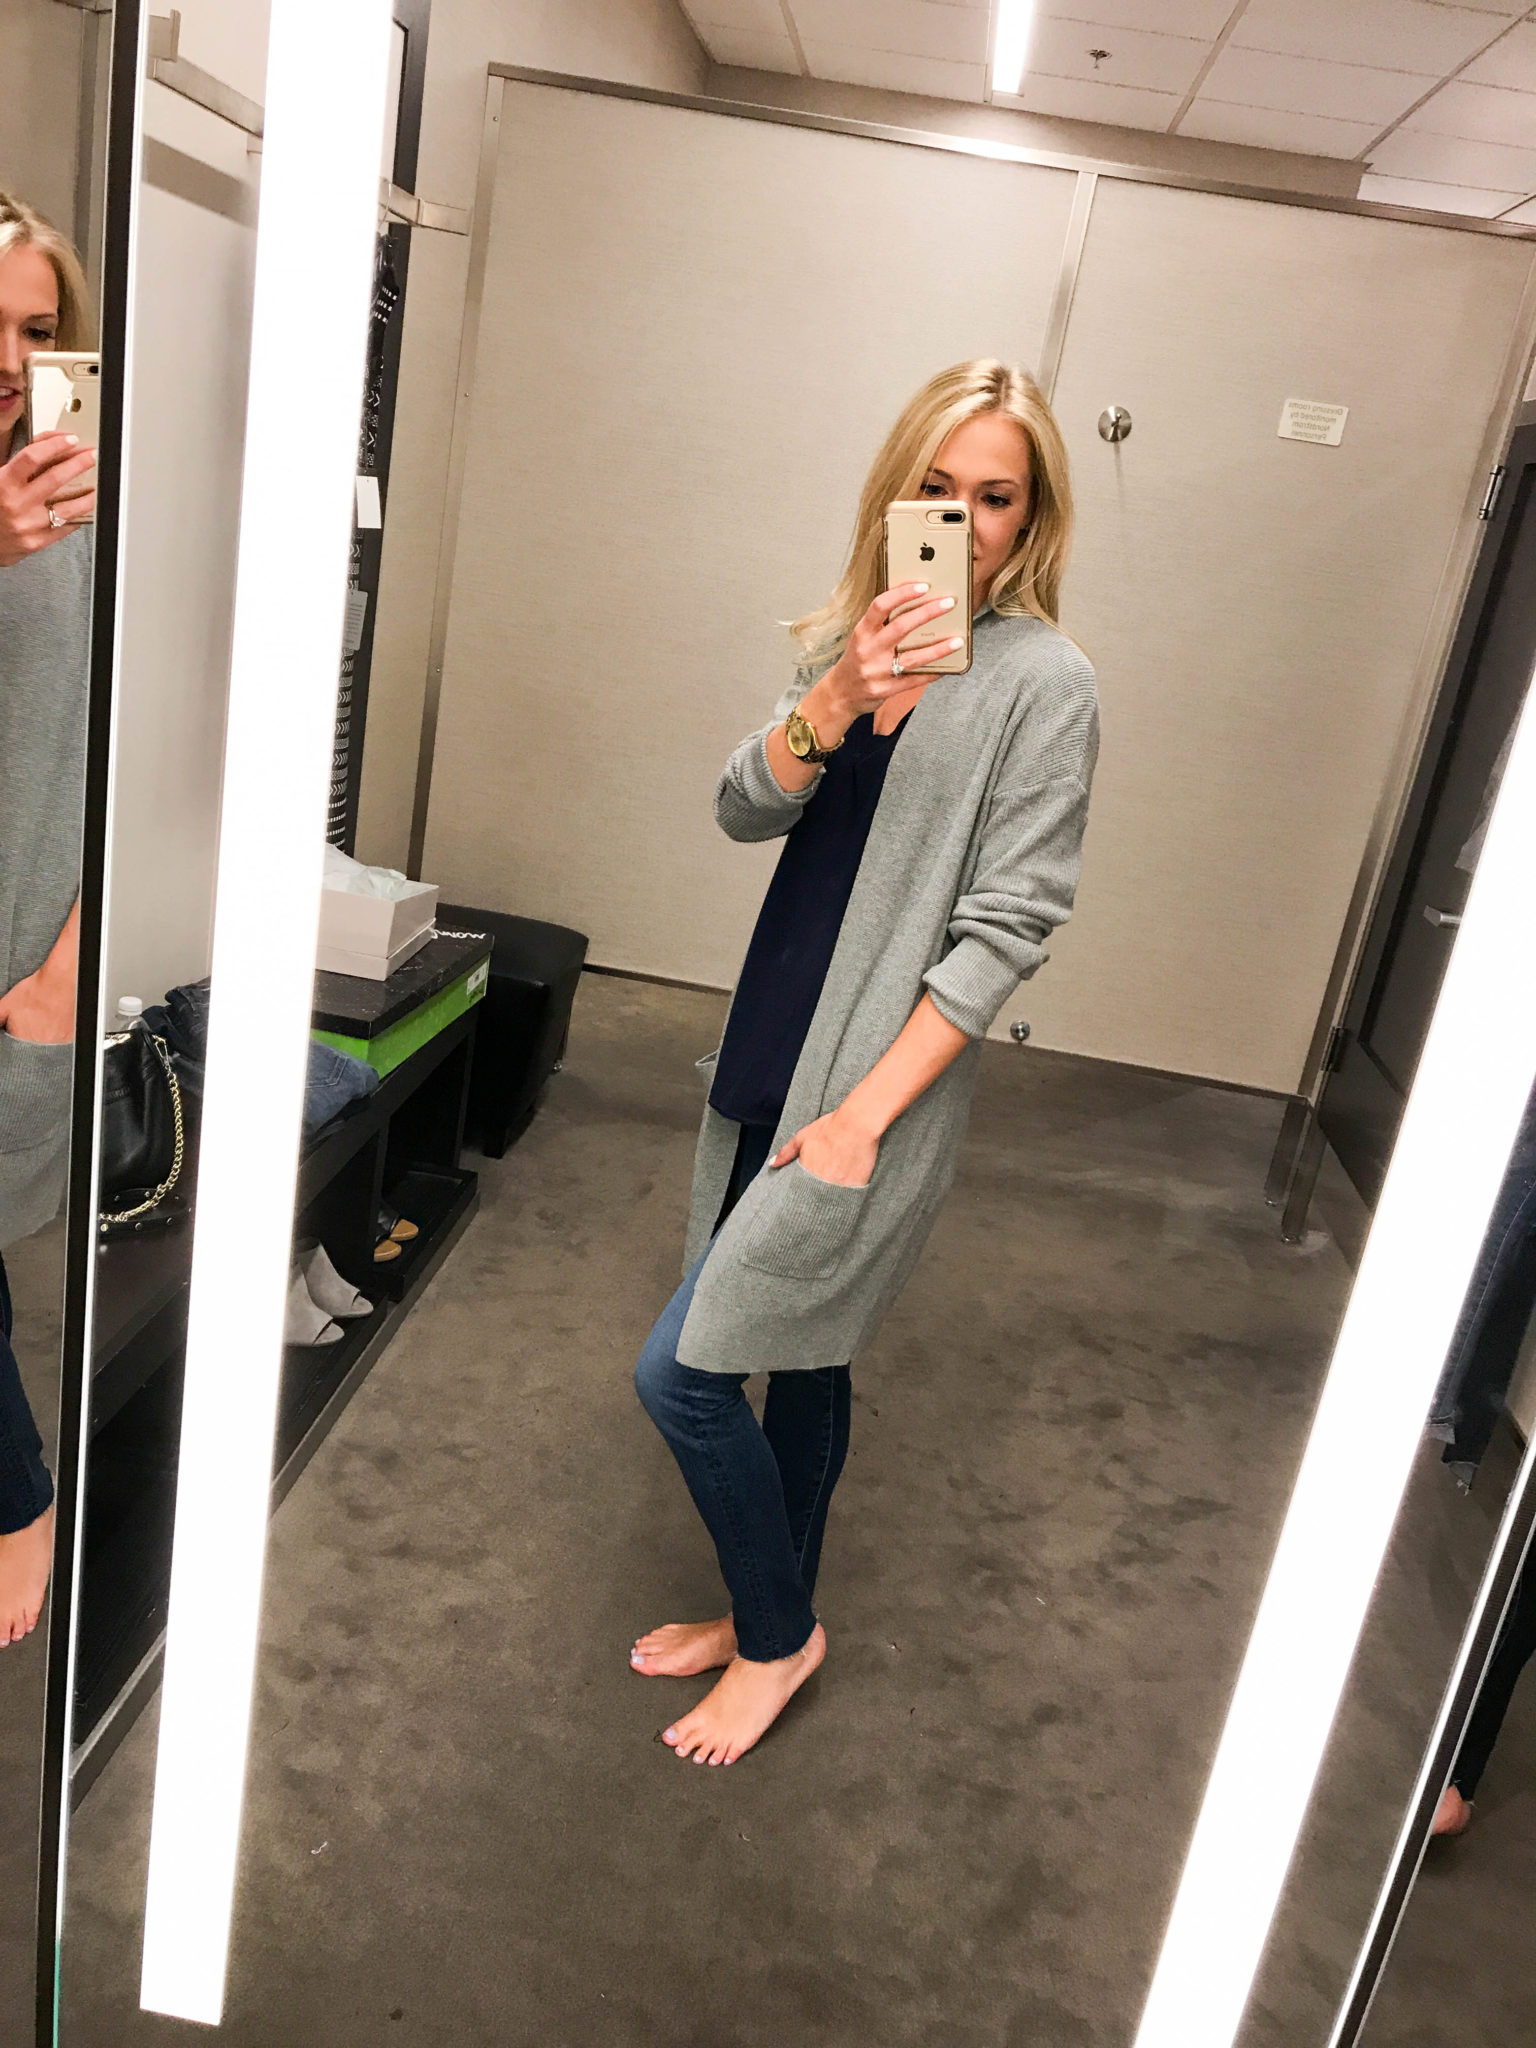 2c6504ada9d1 Nicole Alexander - Fashion - Lifestyle - Wardrobe Stylist